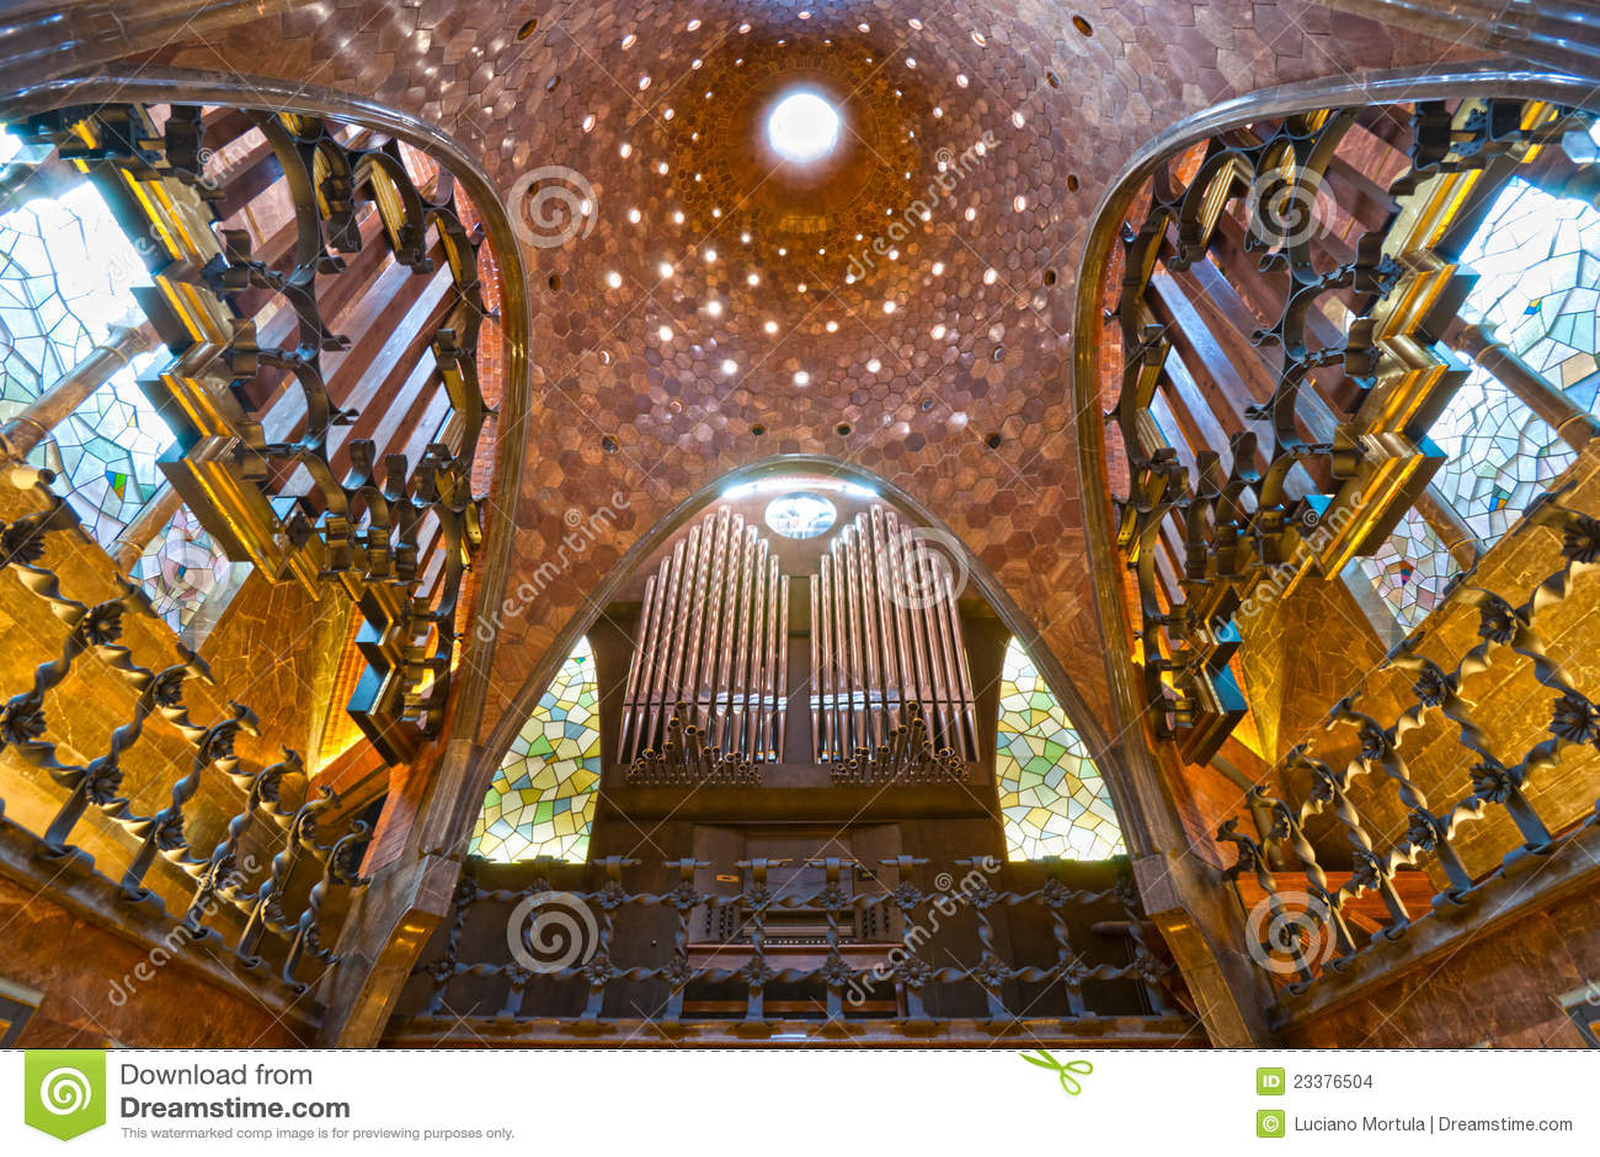 Palau Guell Barcelona Spain Stock Photo  Image of chimney europe 23376504